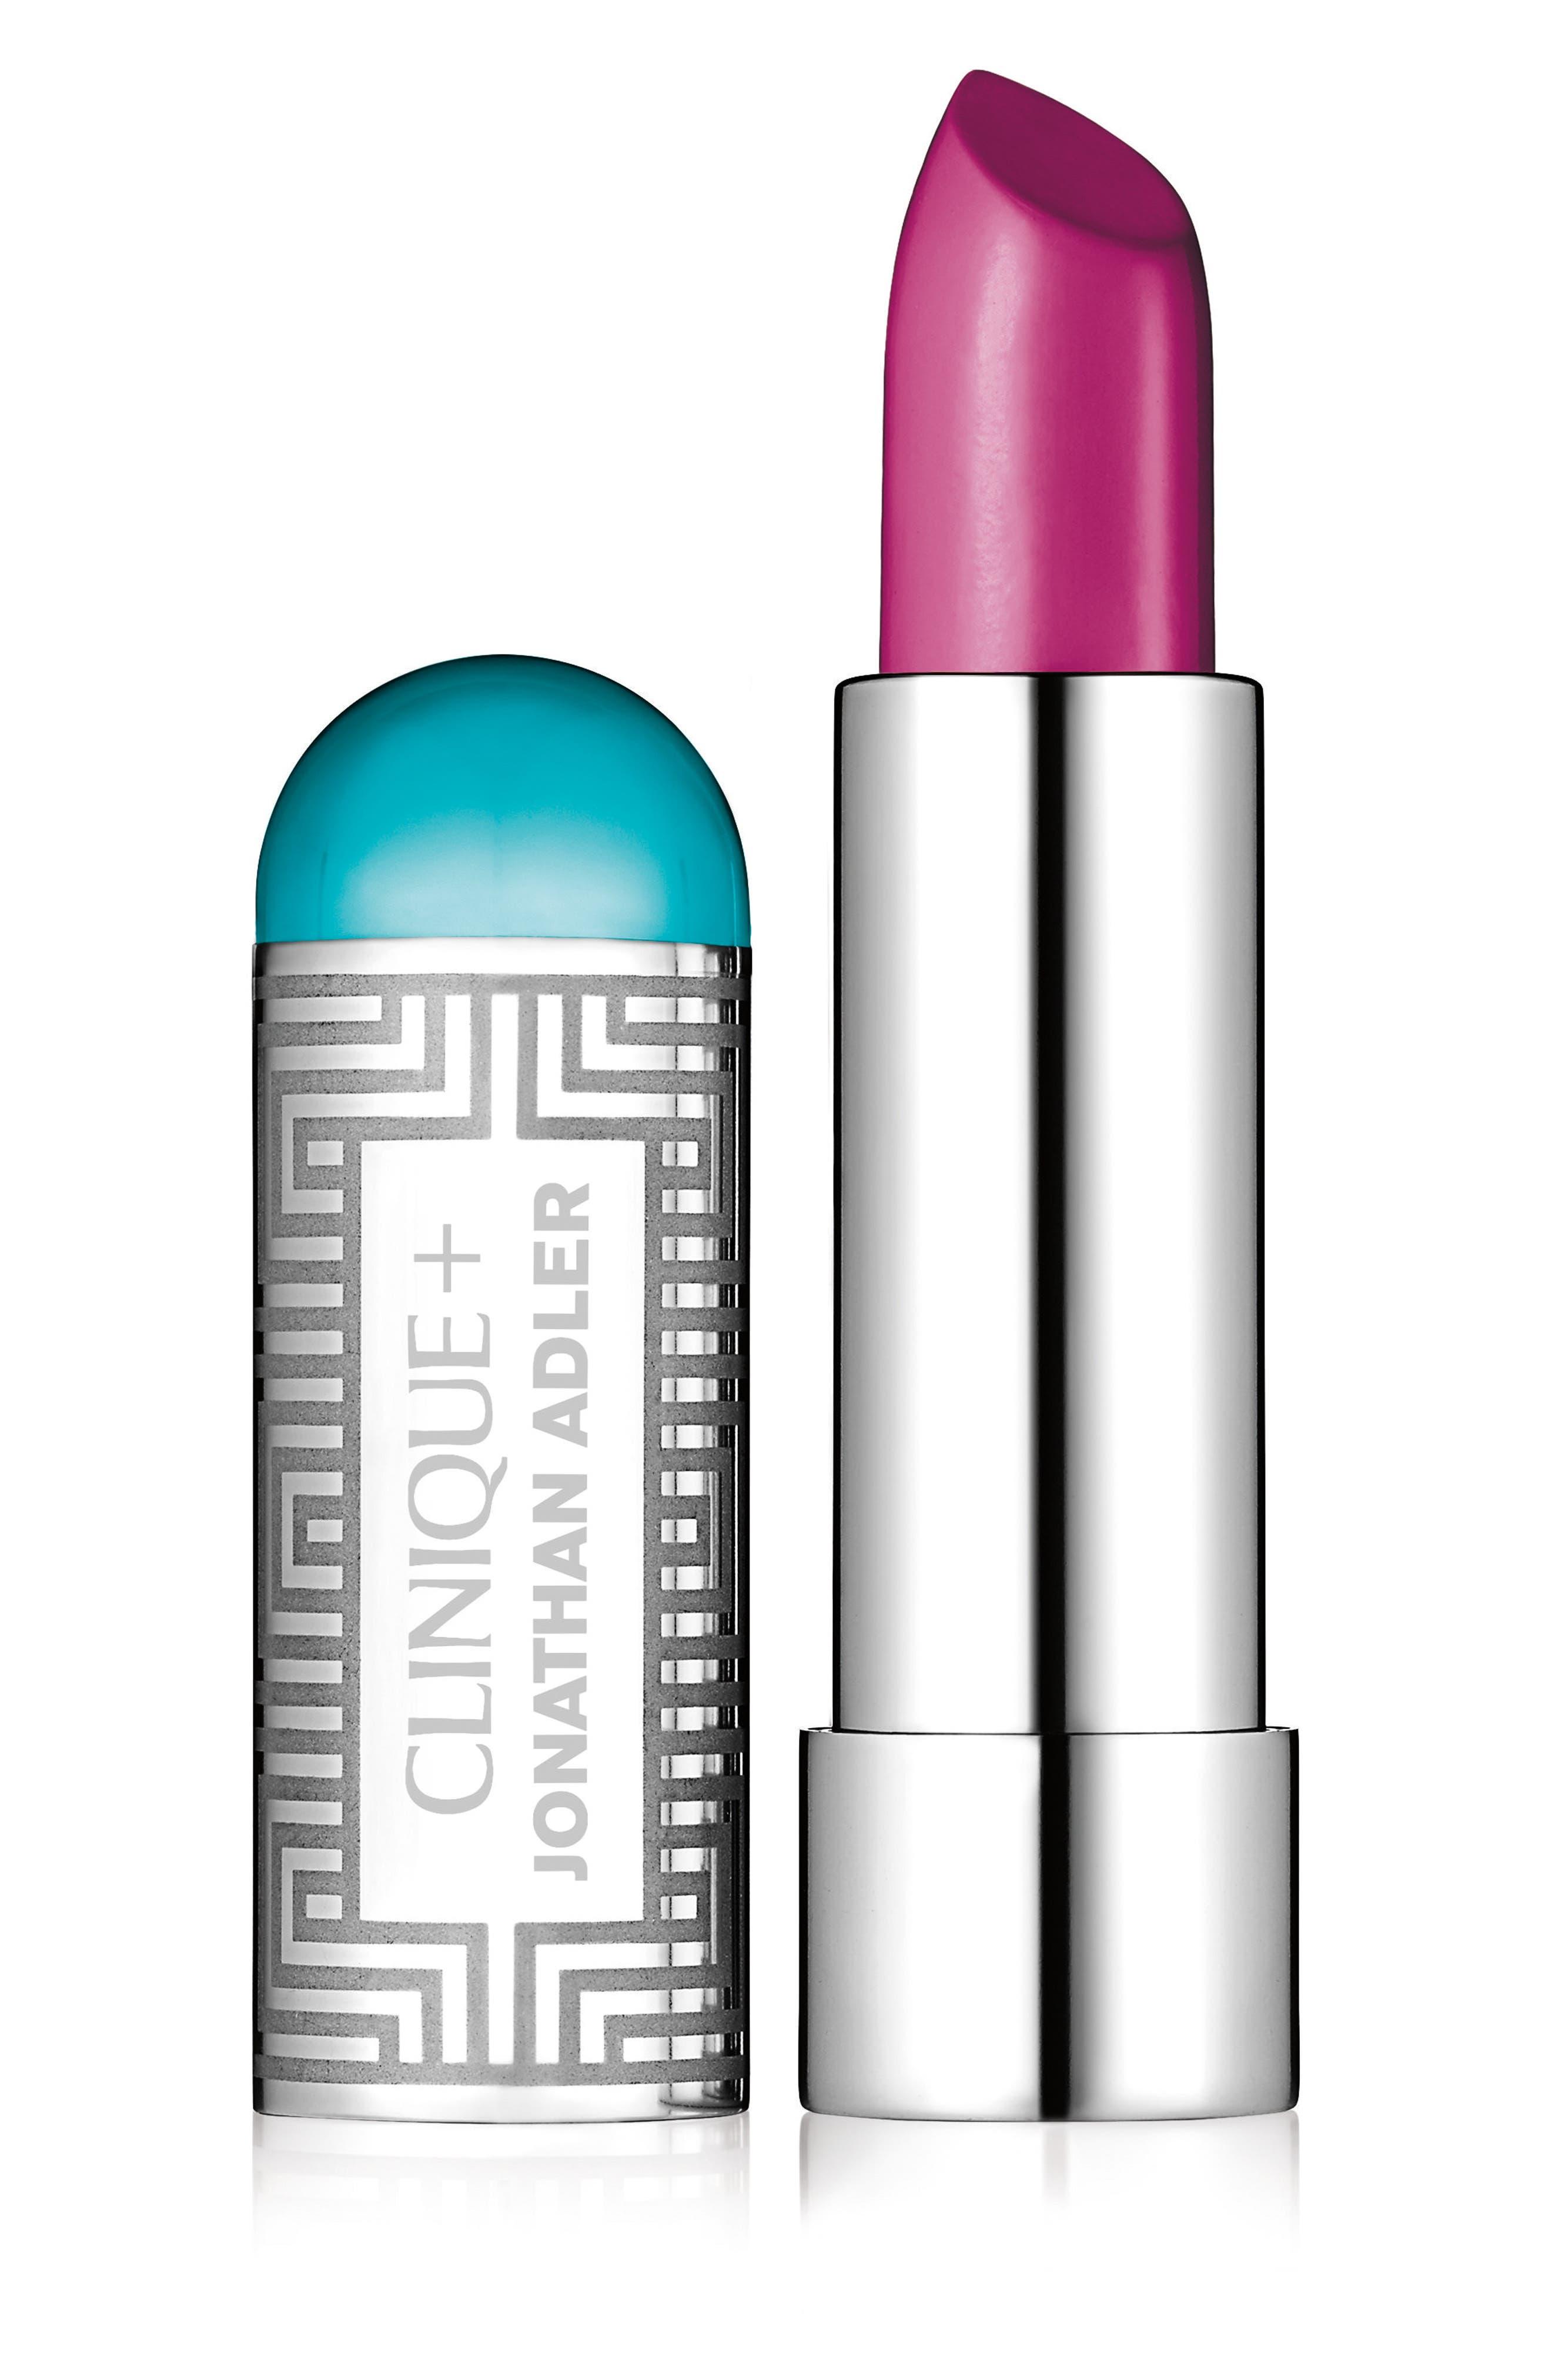 Main Image - Clinique Jonathan Adler Pop Lip Color + Primer (Limited Edition)